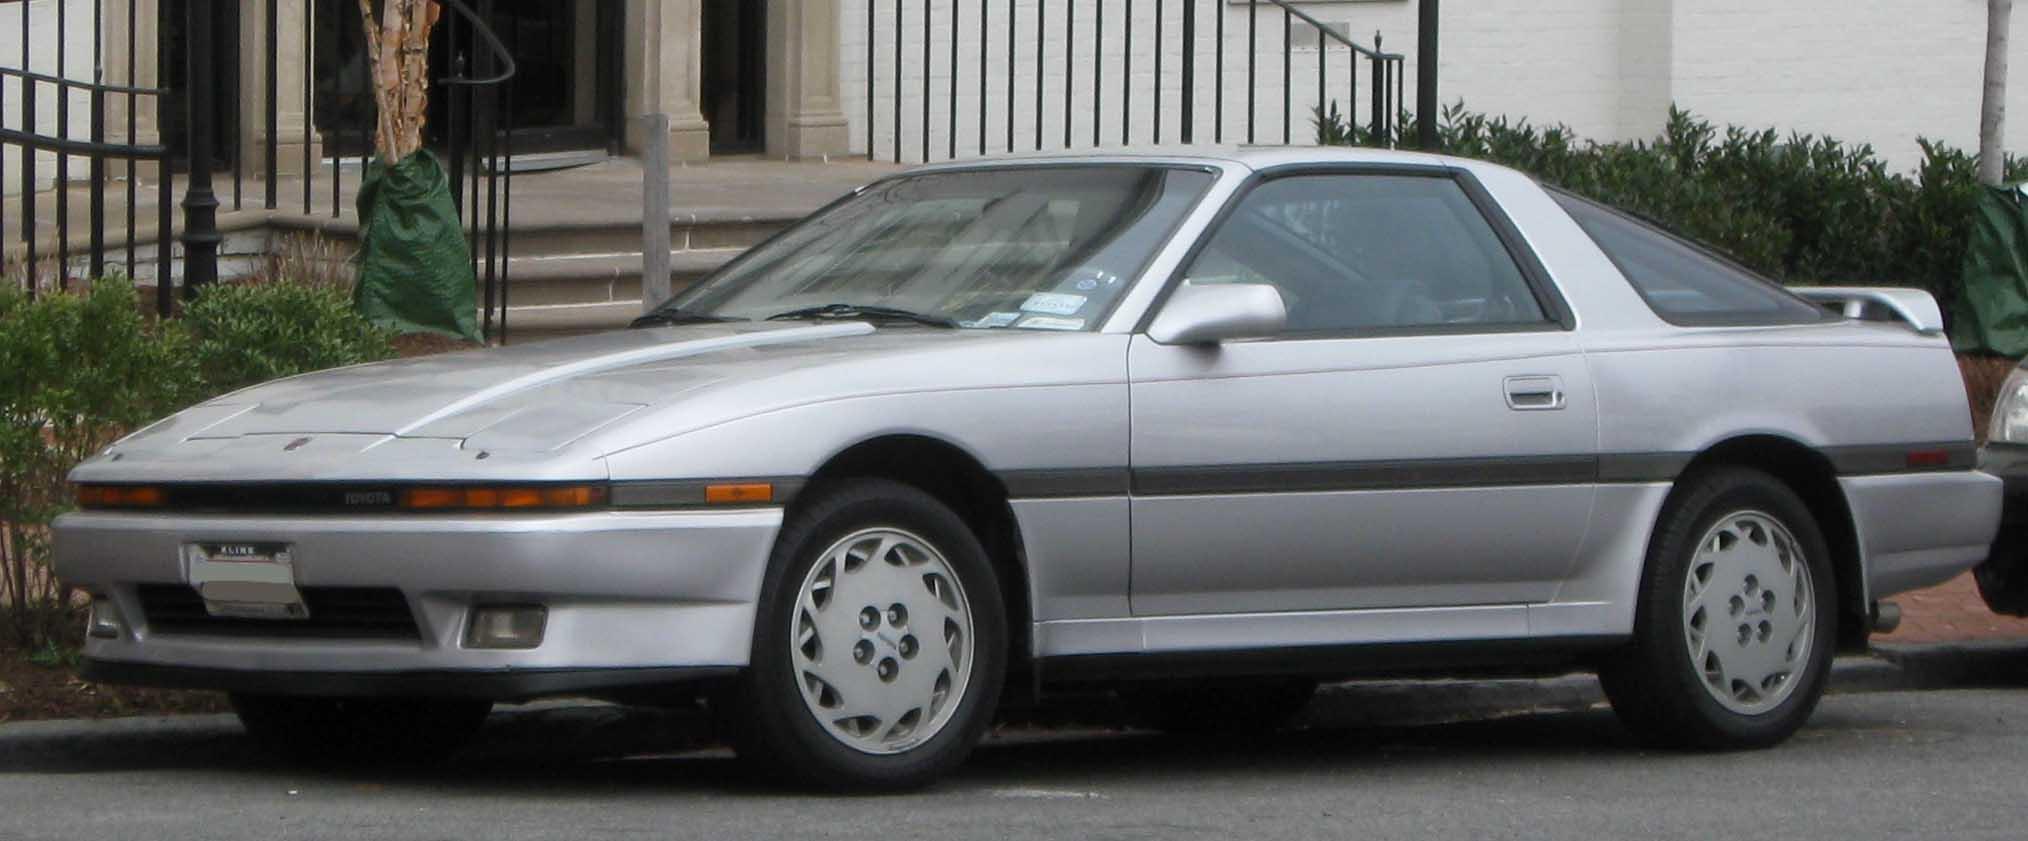 Toyota Supra - WriteWork